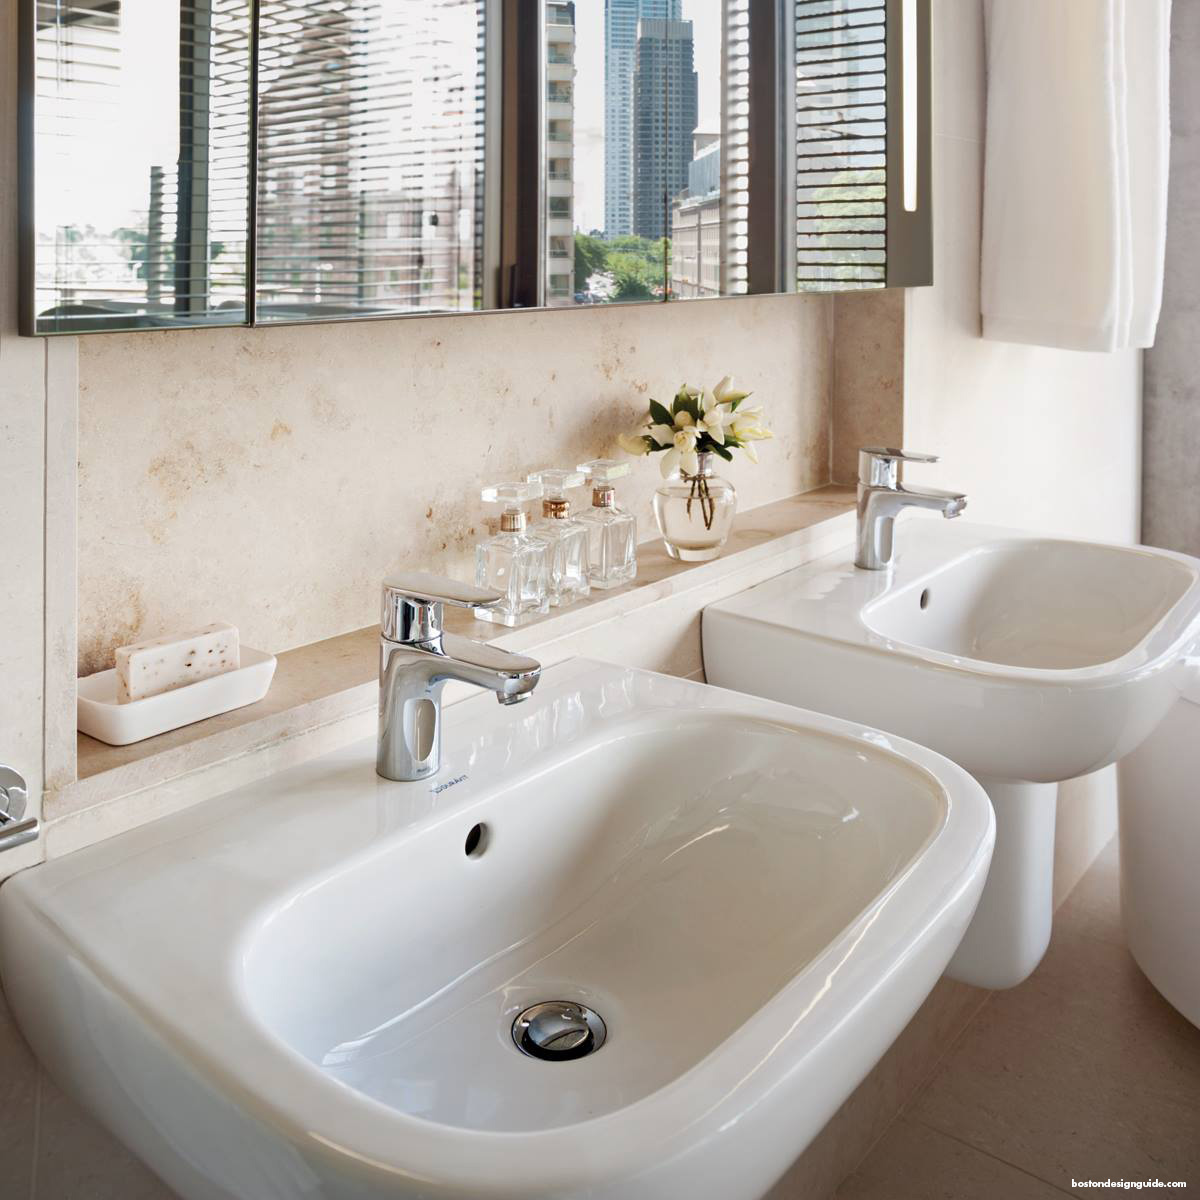 Coastal Plumbing Supply Kitchen Bath Showroom: Designer Bath And Salem Plumbing Supply